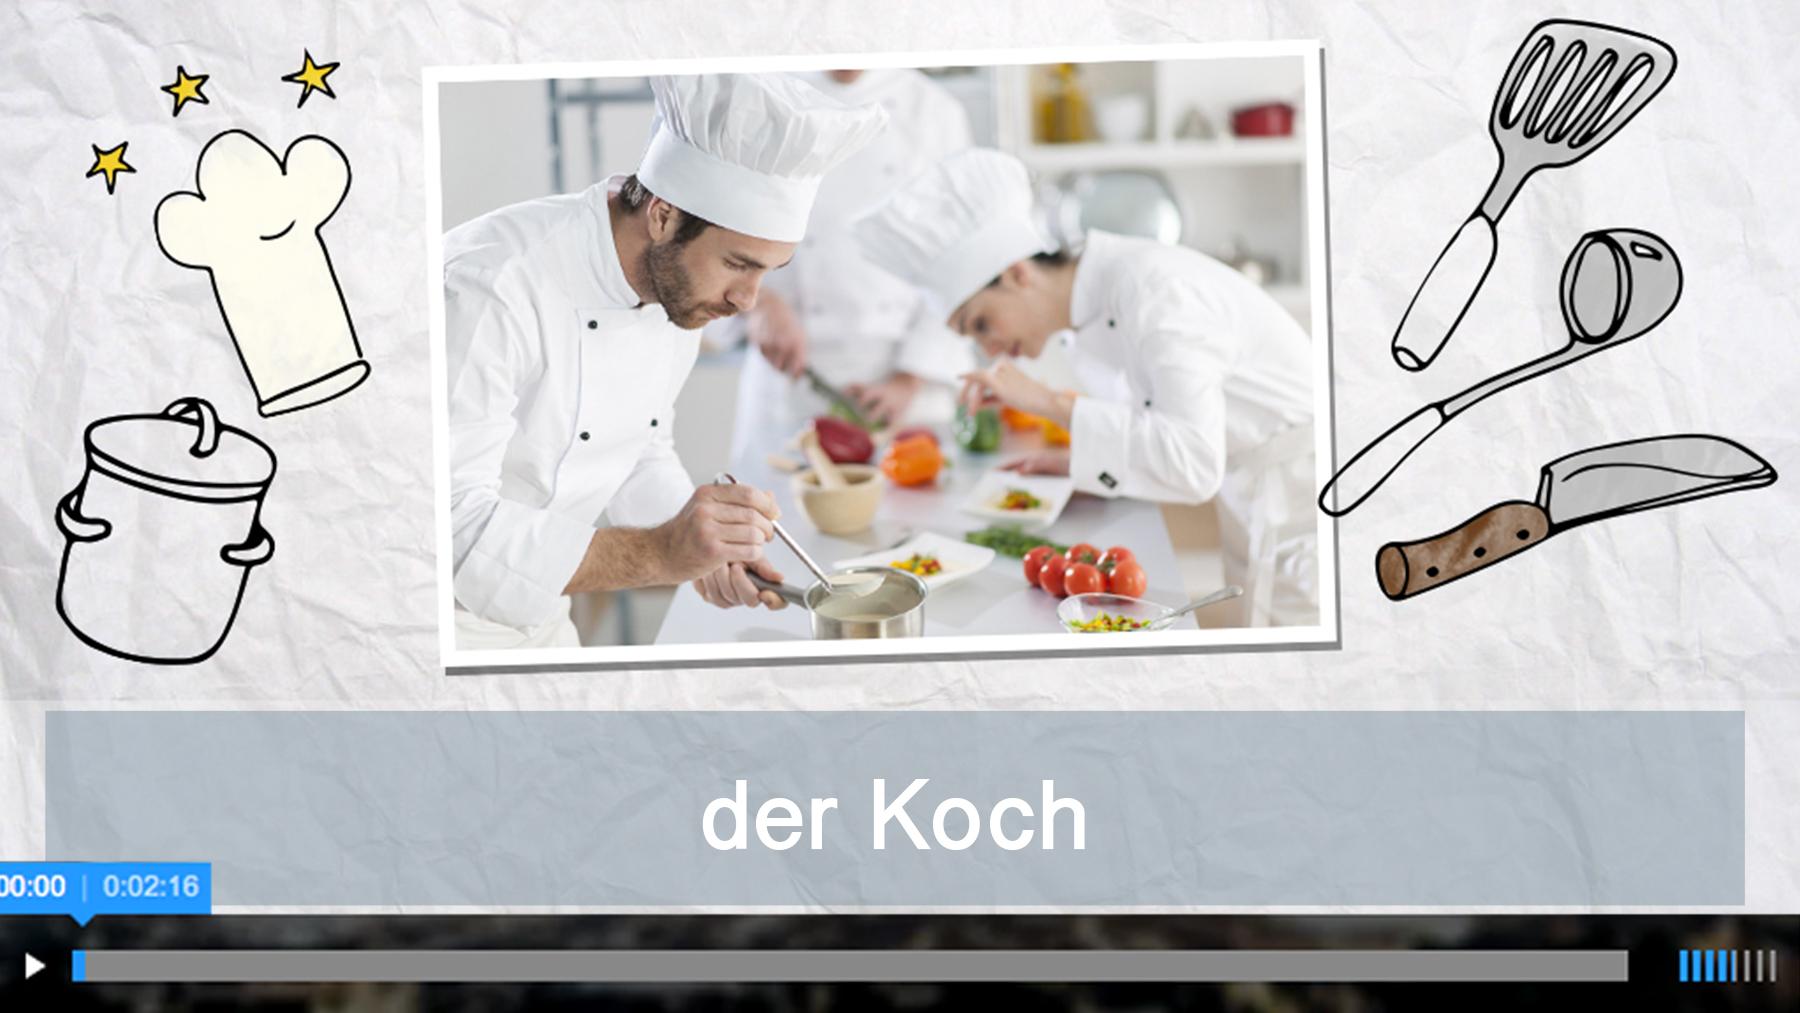 dw-koch